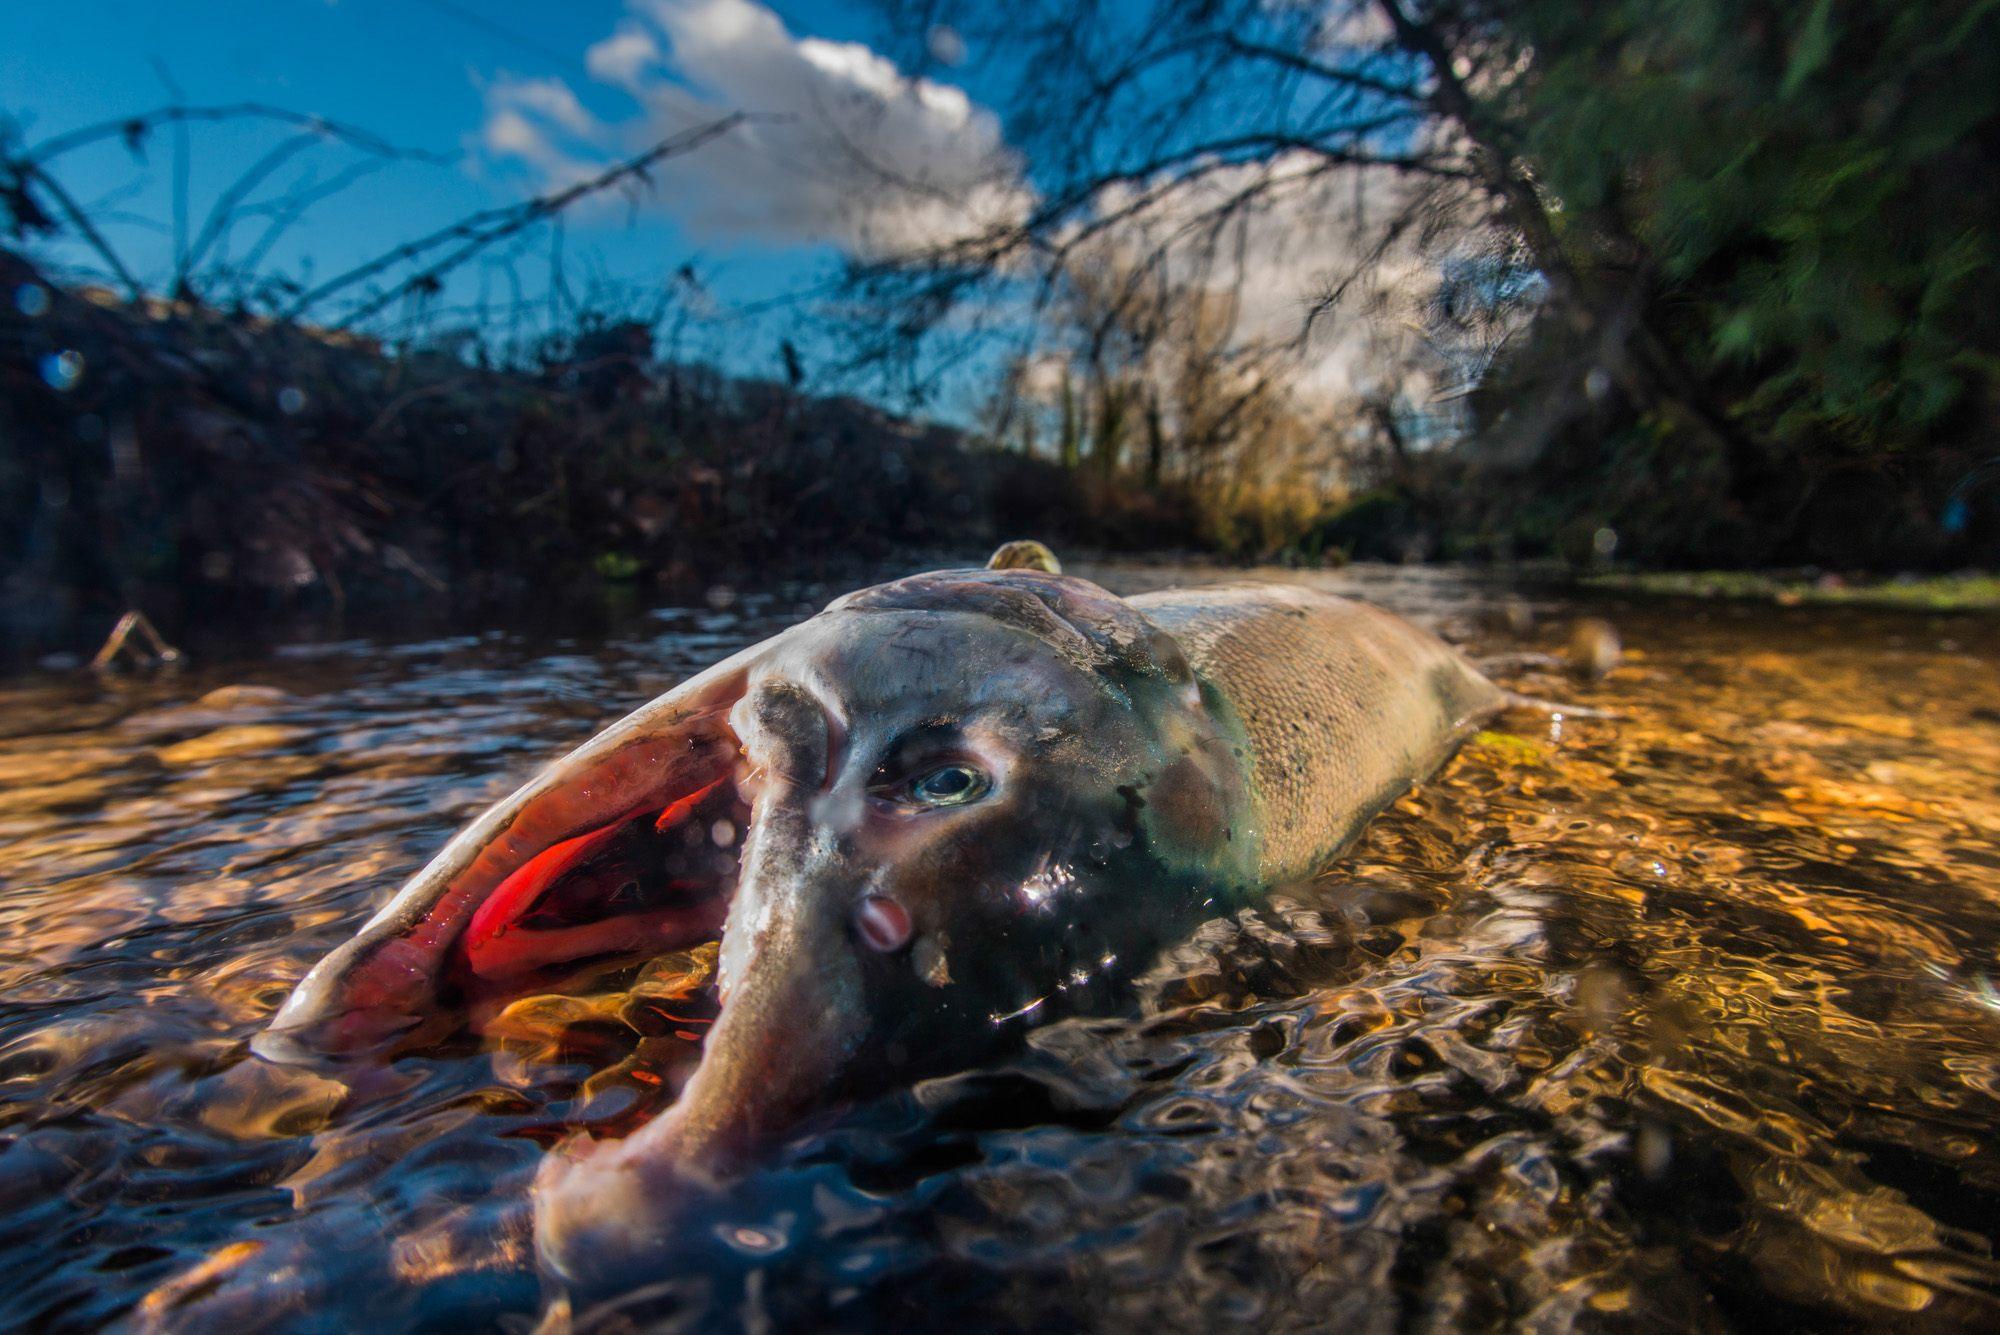 Dead Coho Salmon, still in its ocean colors in Brunette River, Burnaby (Fernando Lessa)